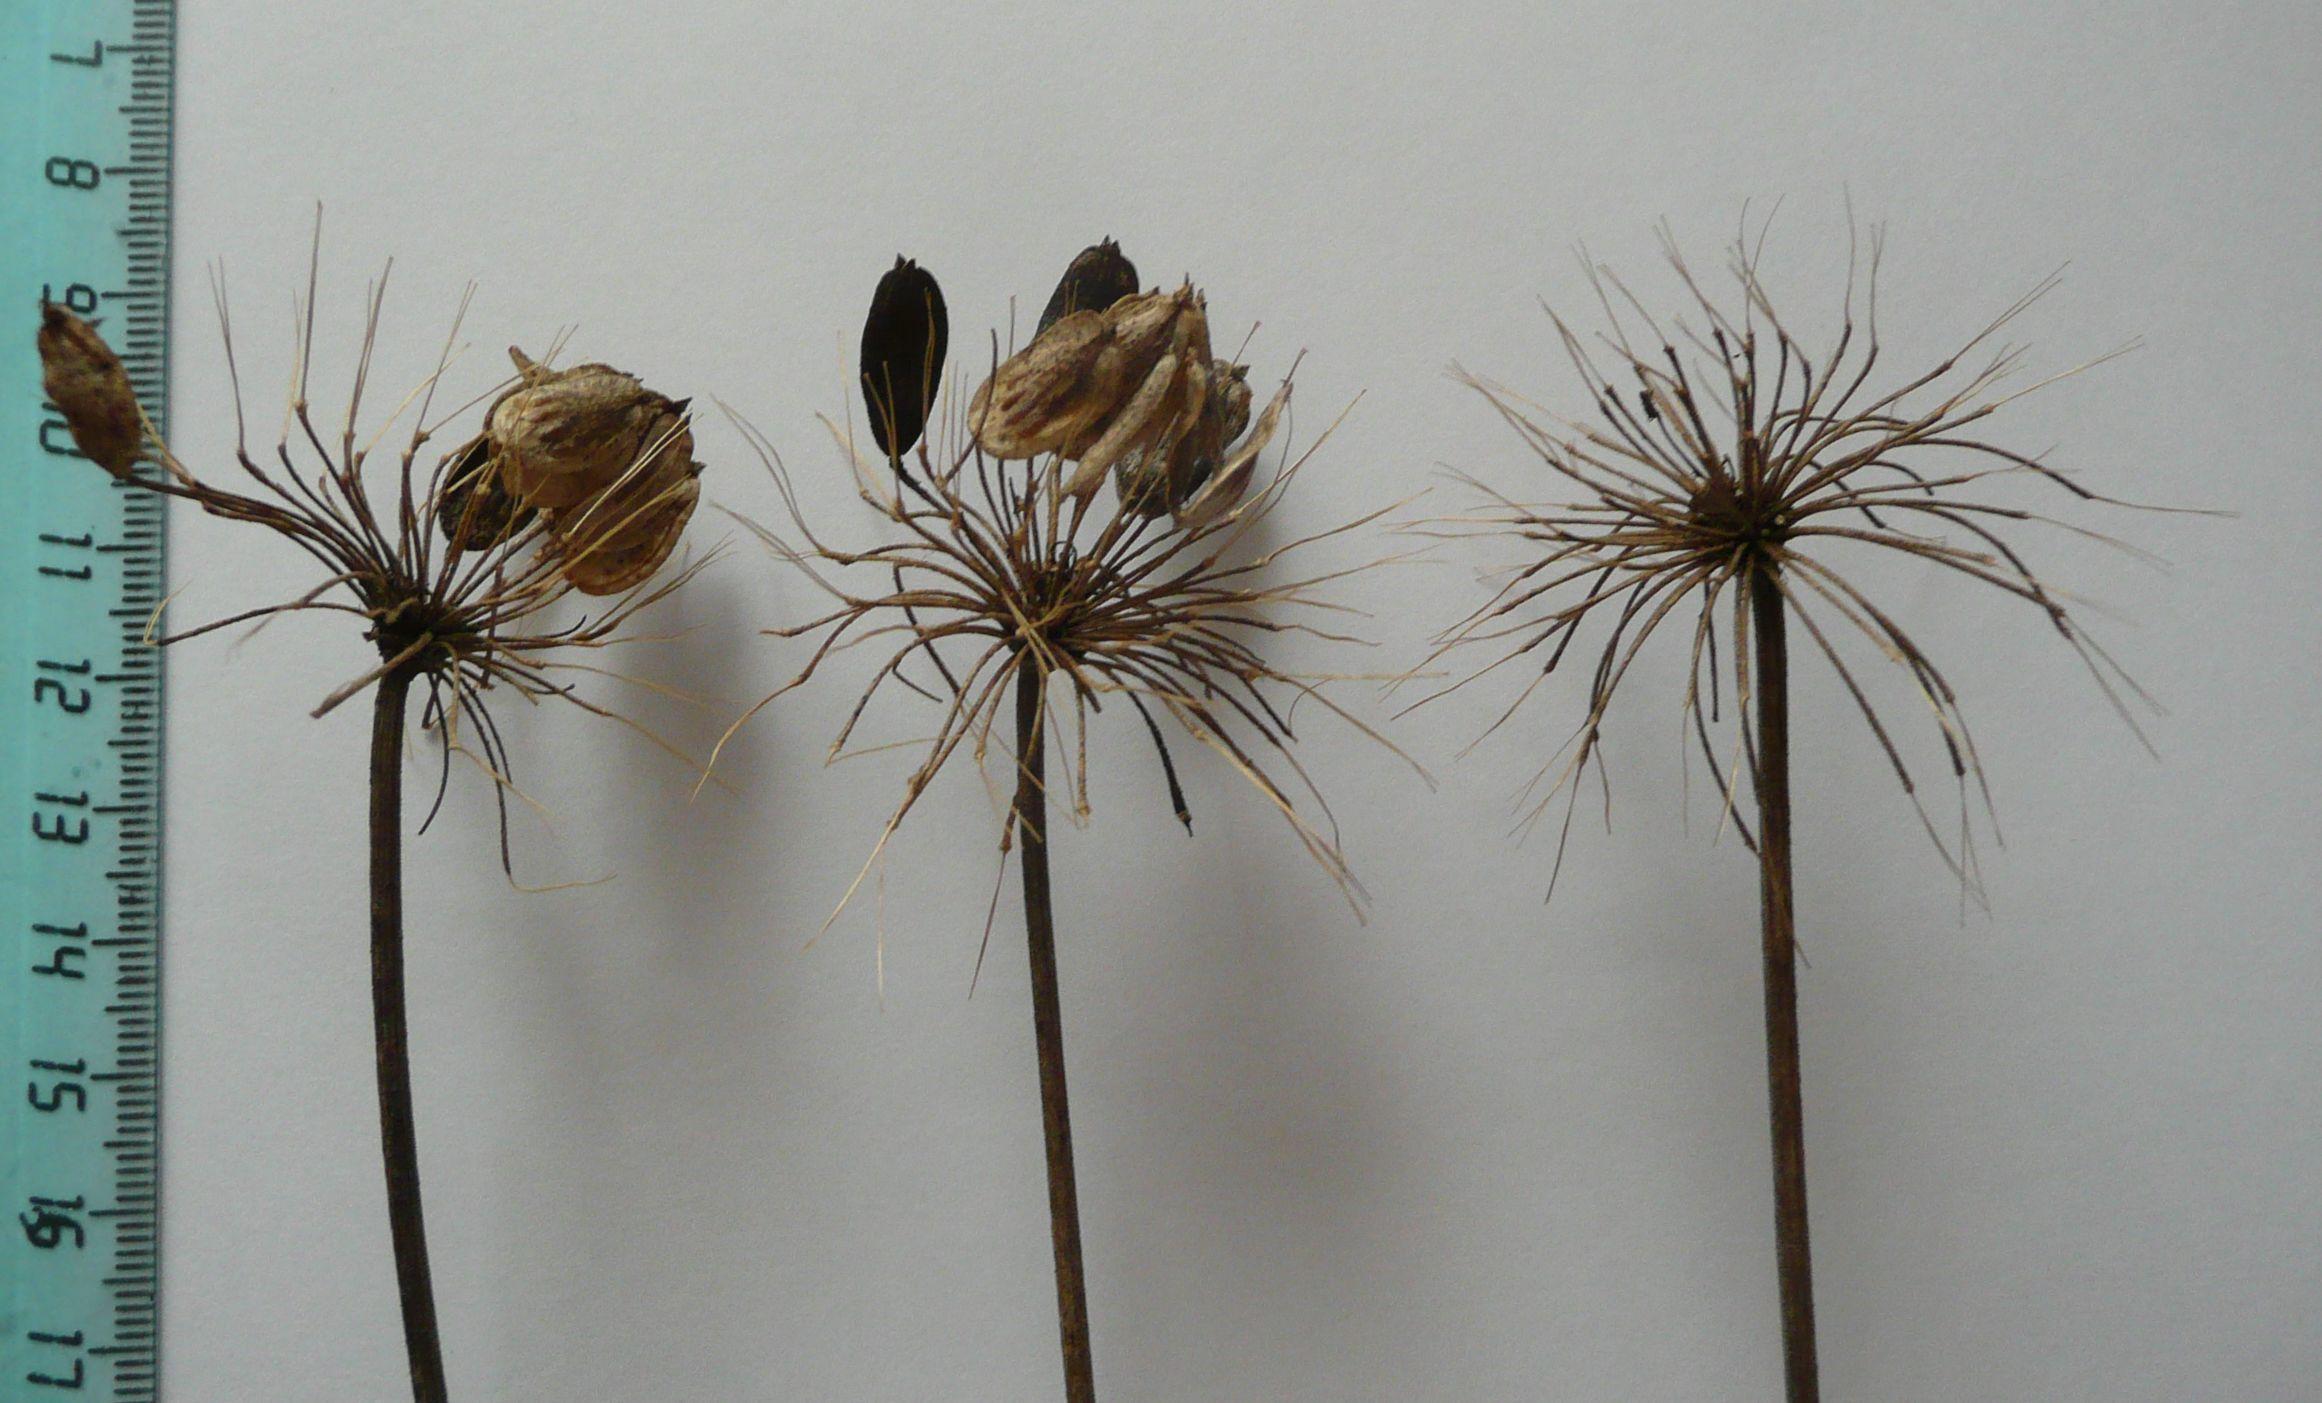 Далеко летят семена зимующие на зонтиках!